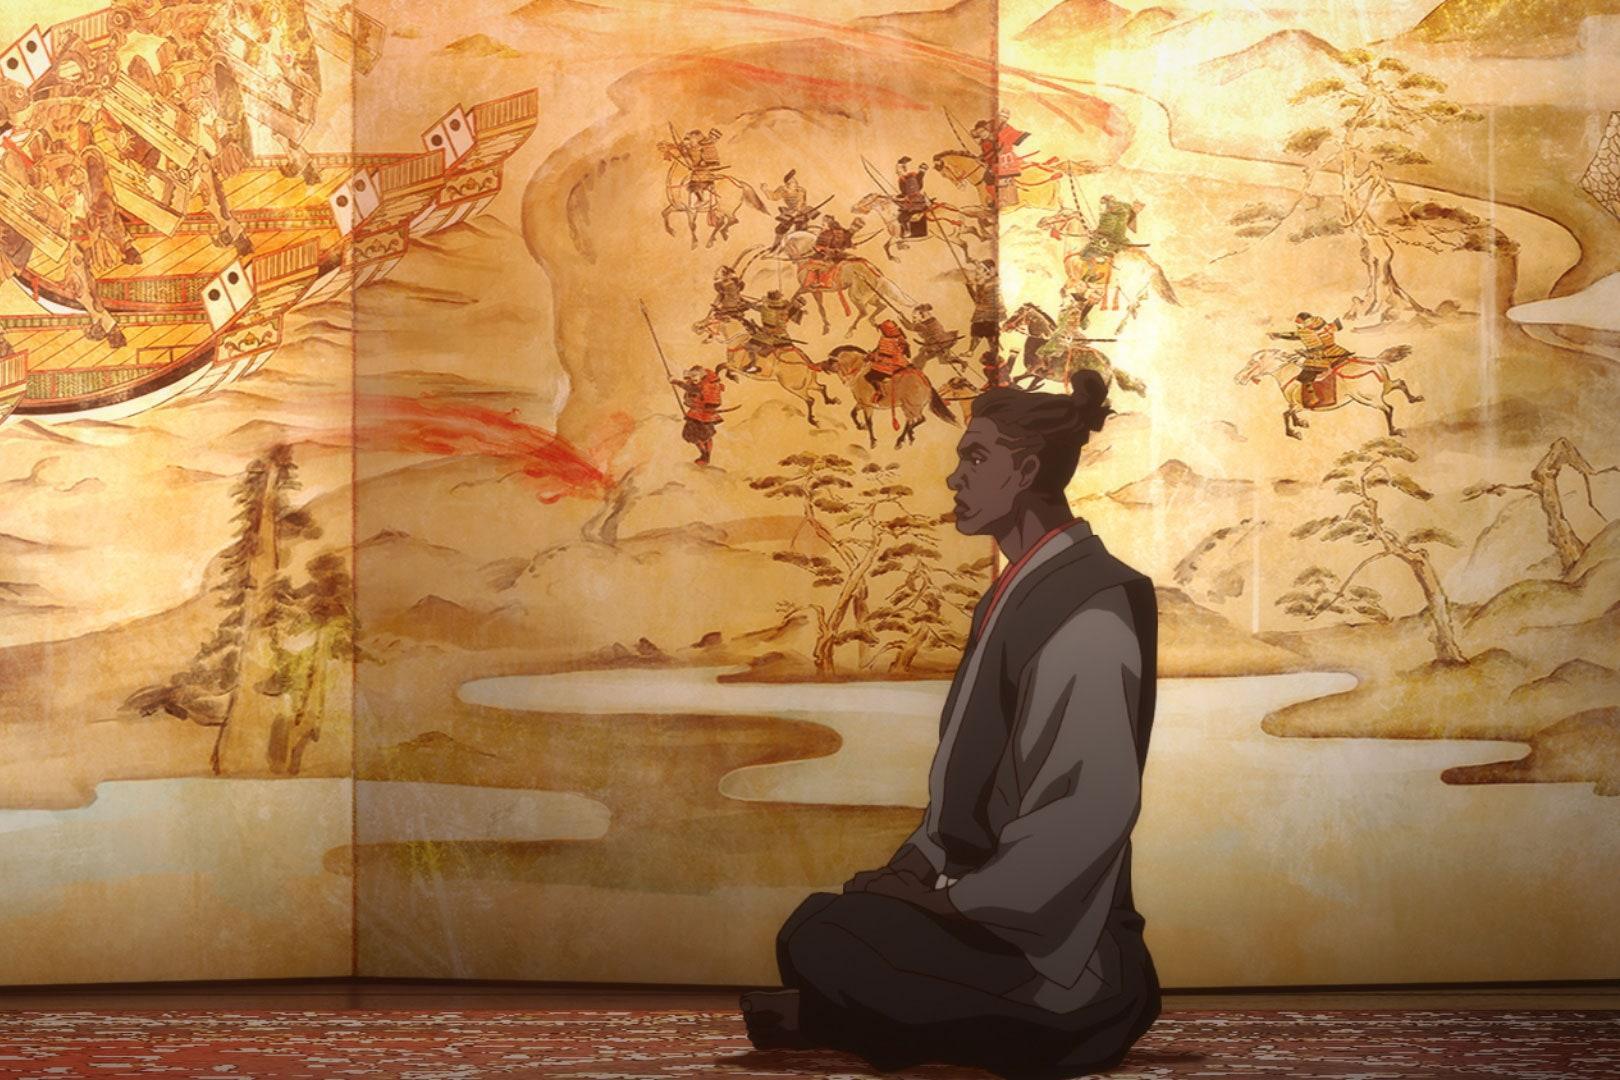 yasuke-netflix-black-samurai